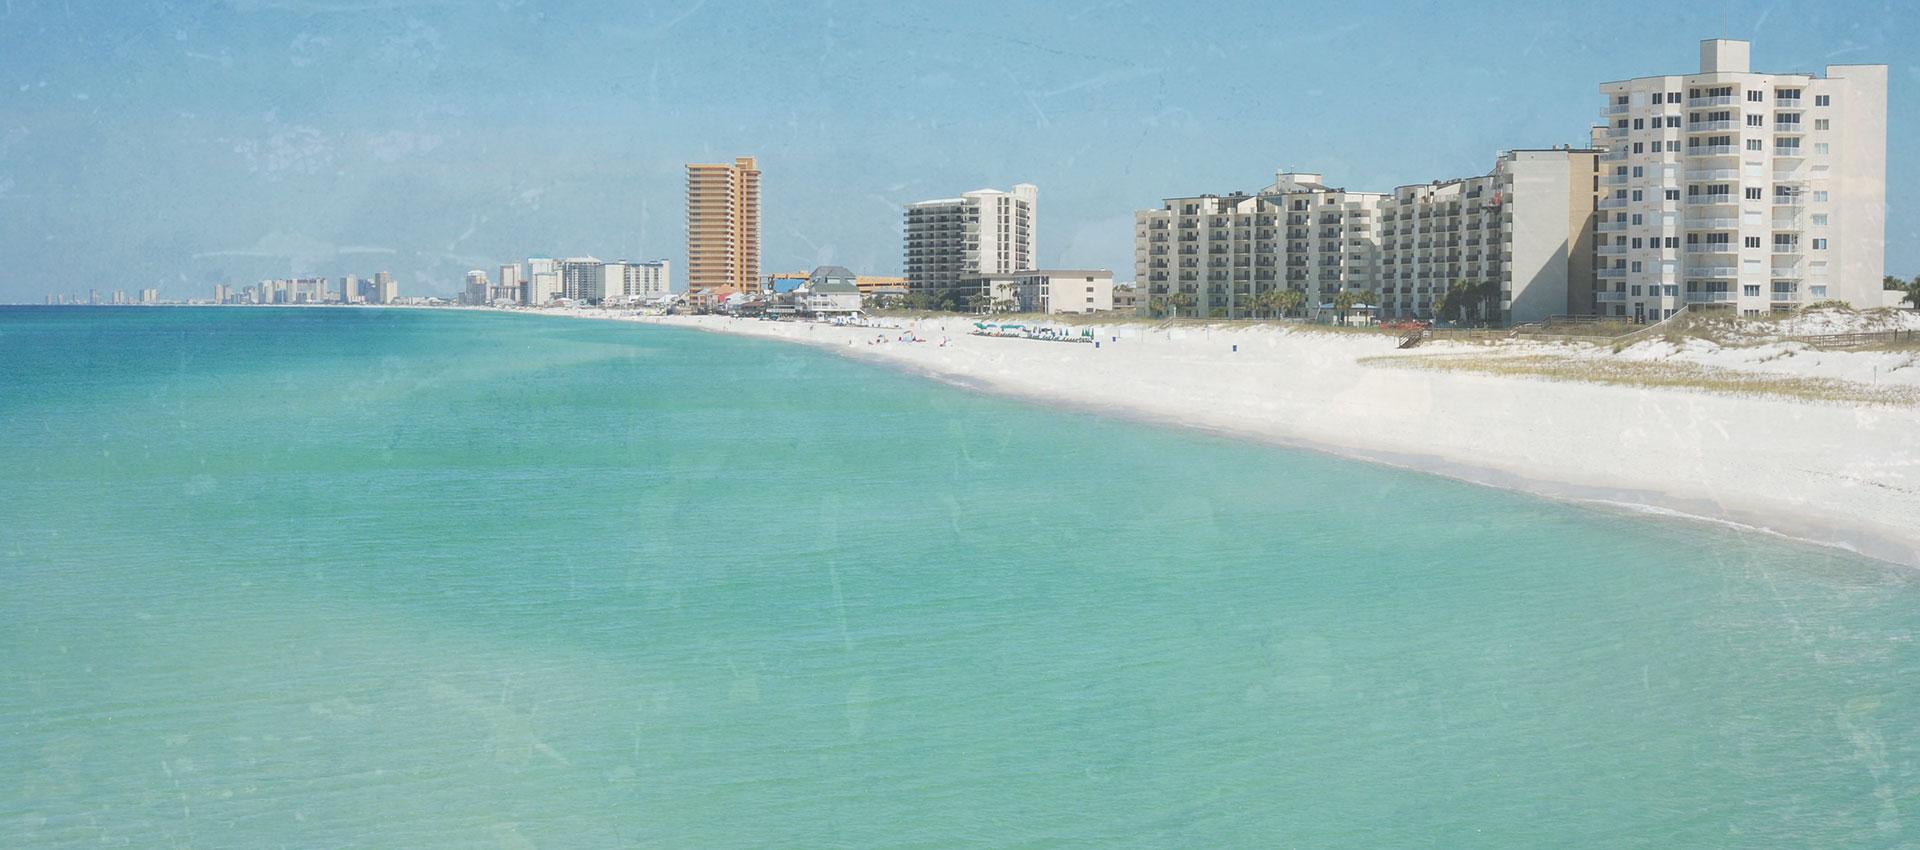 Jacksonville Beach Fl Events Today